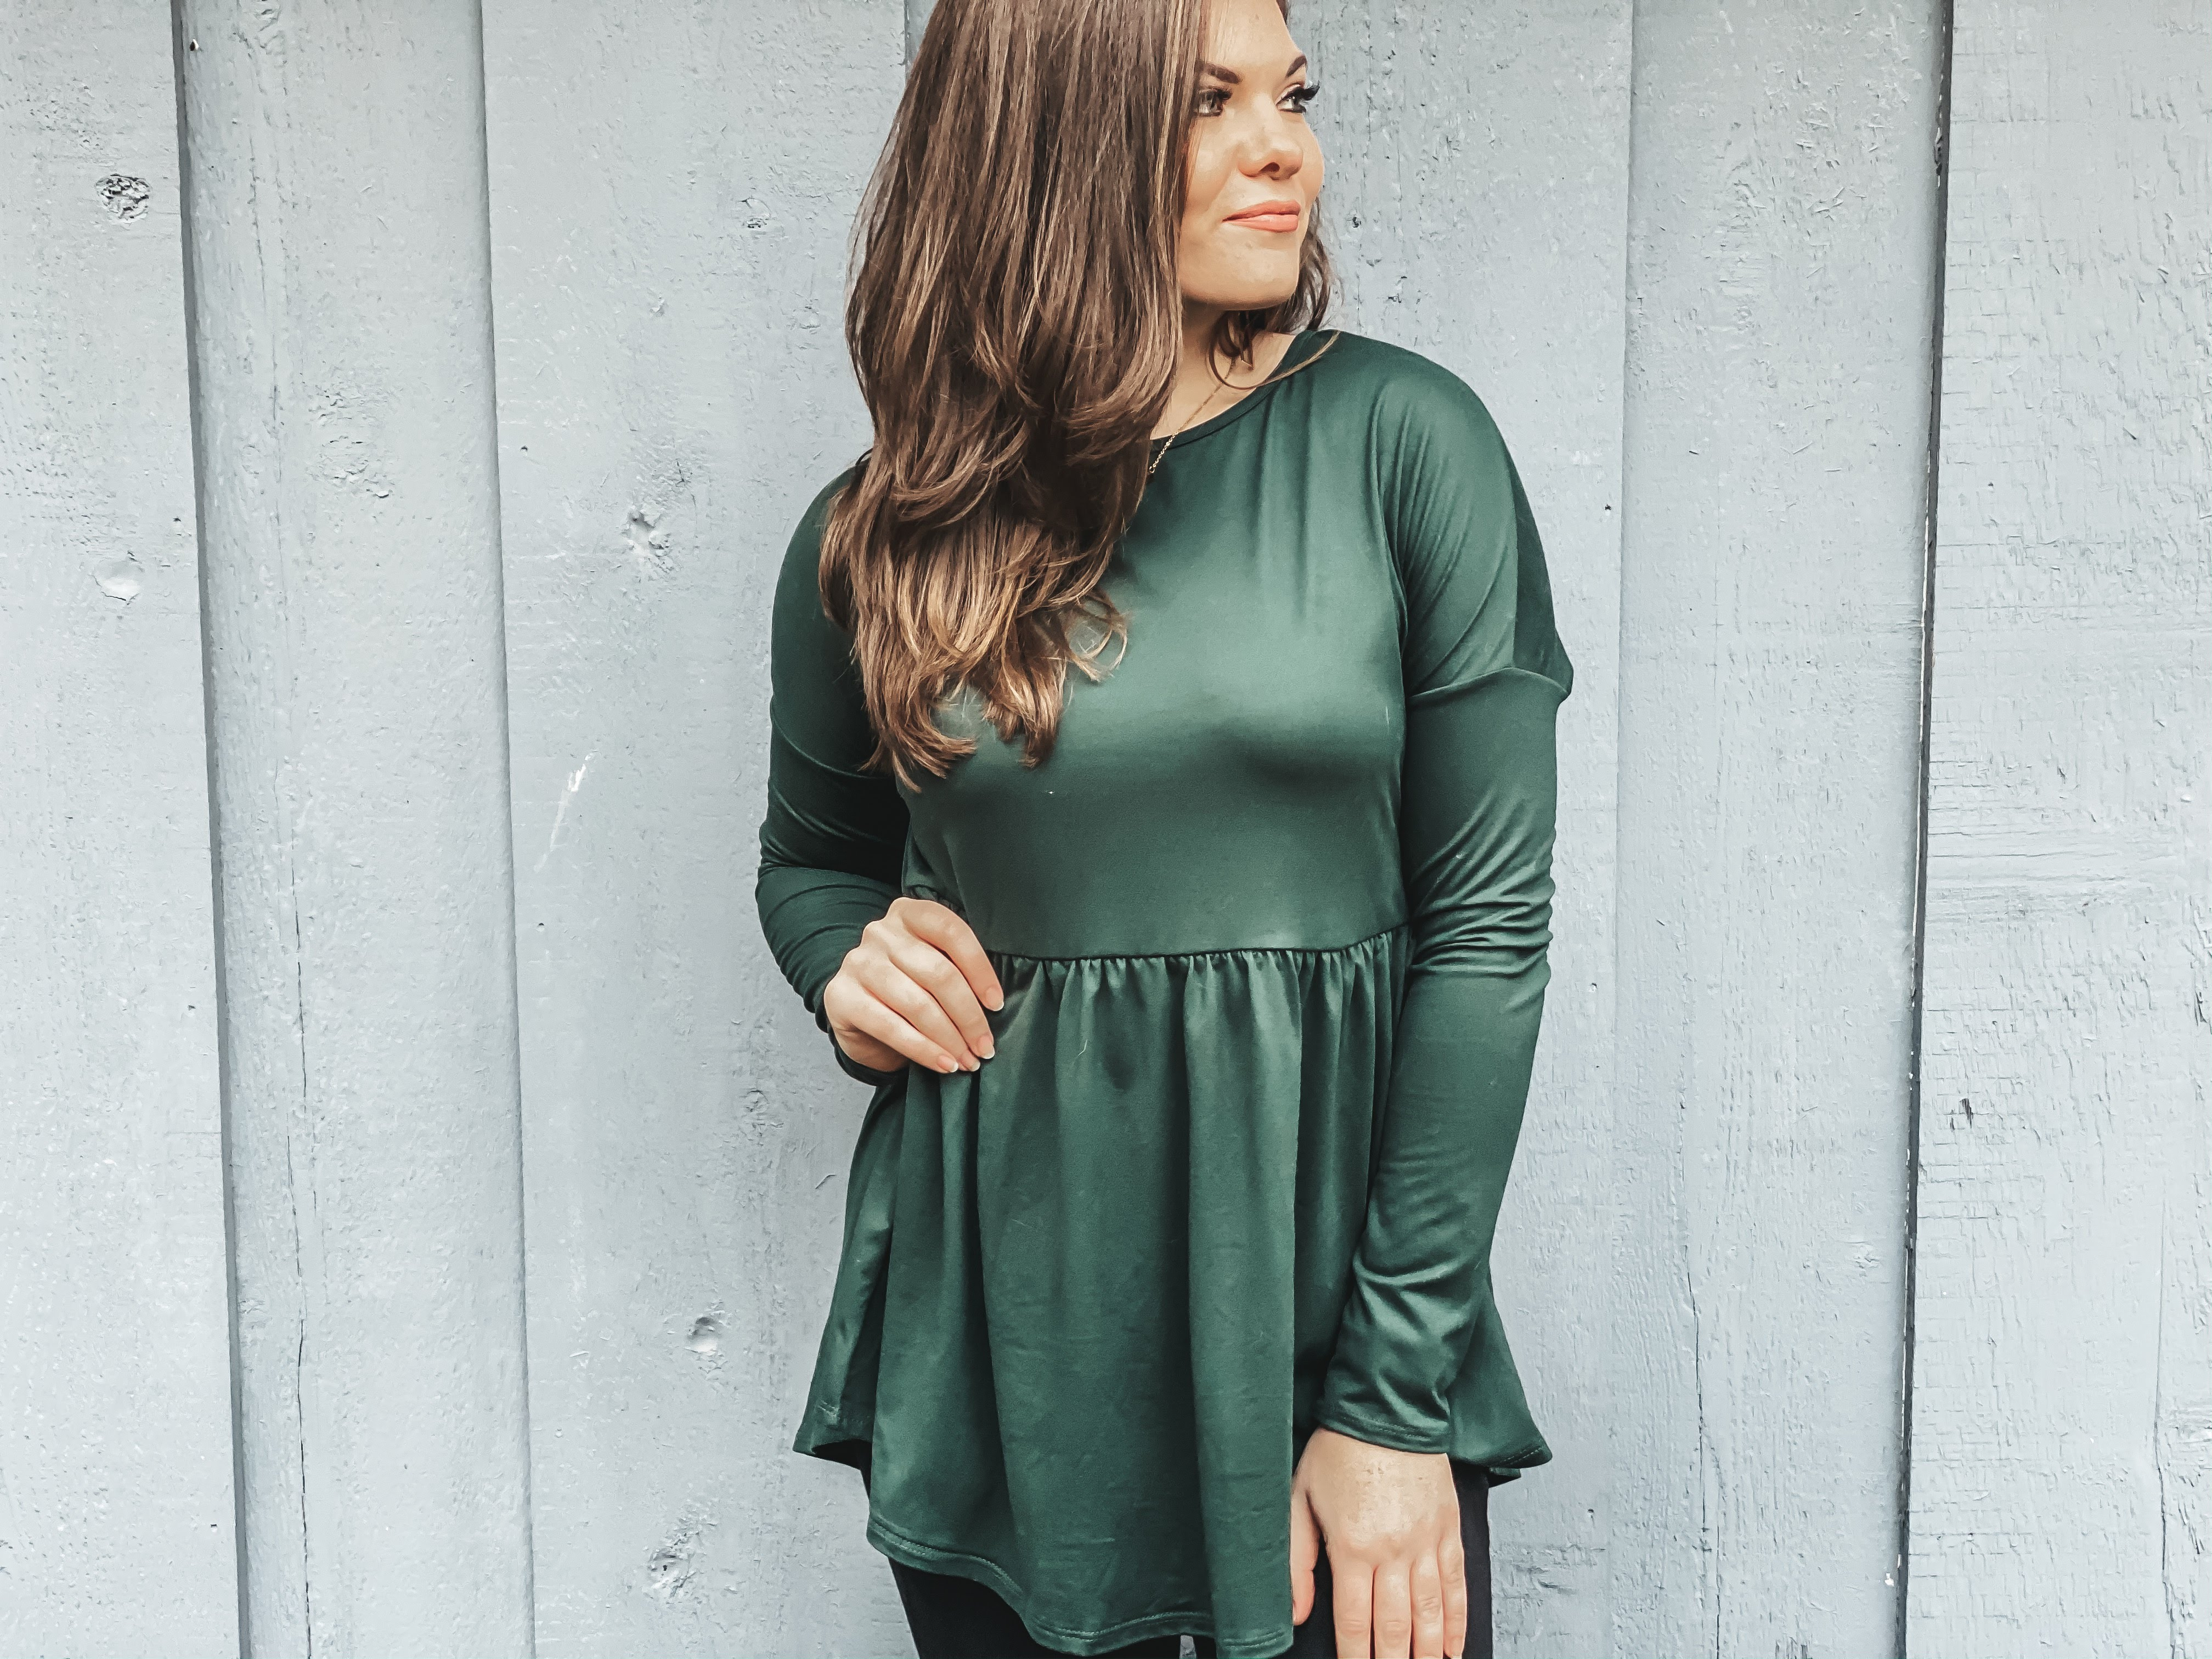 Gemstone Boutique Emerald Blouse